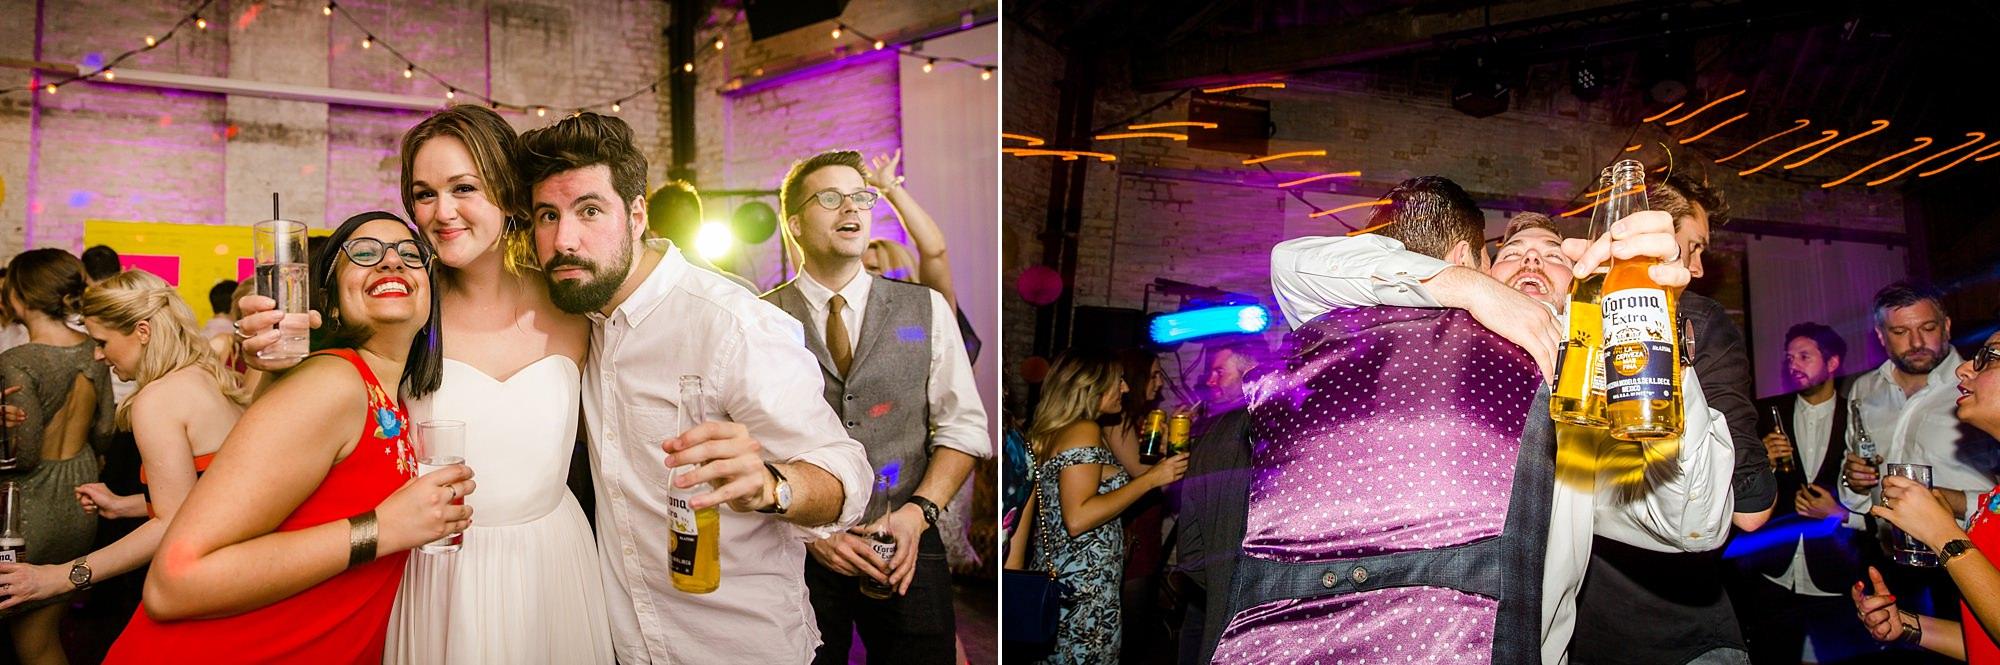 Fun London Wedding guests enjoying evening reception party in brixton